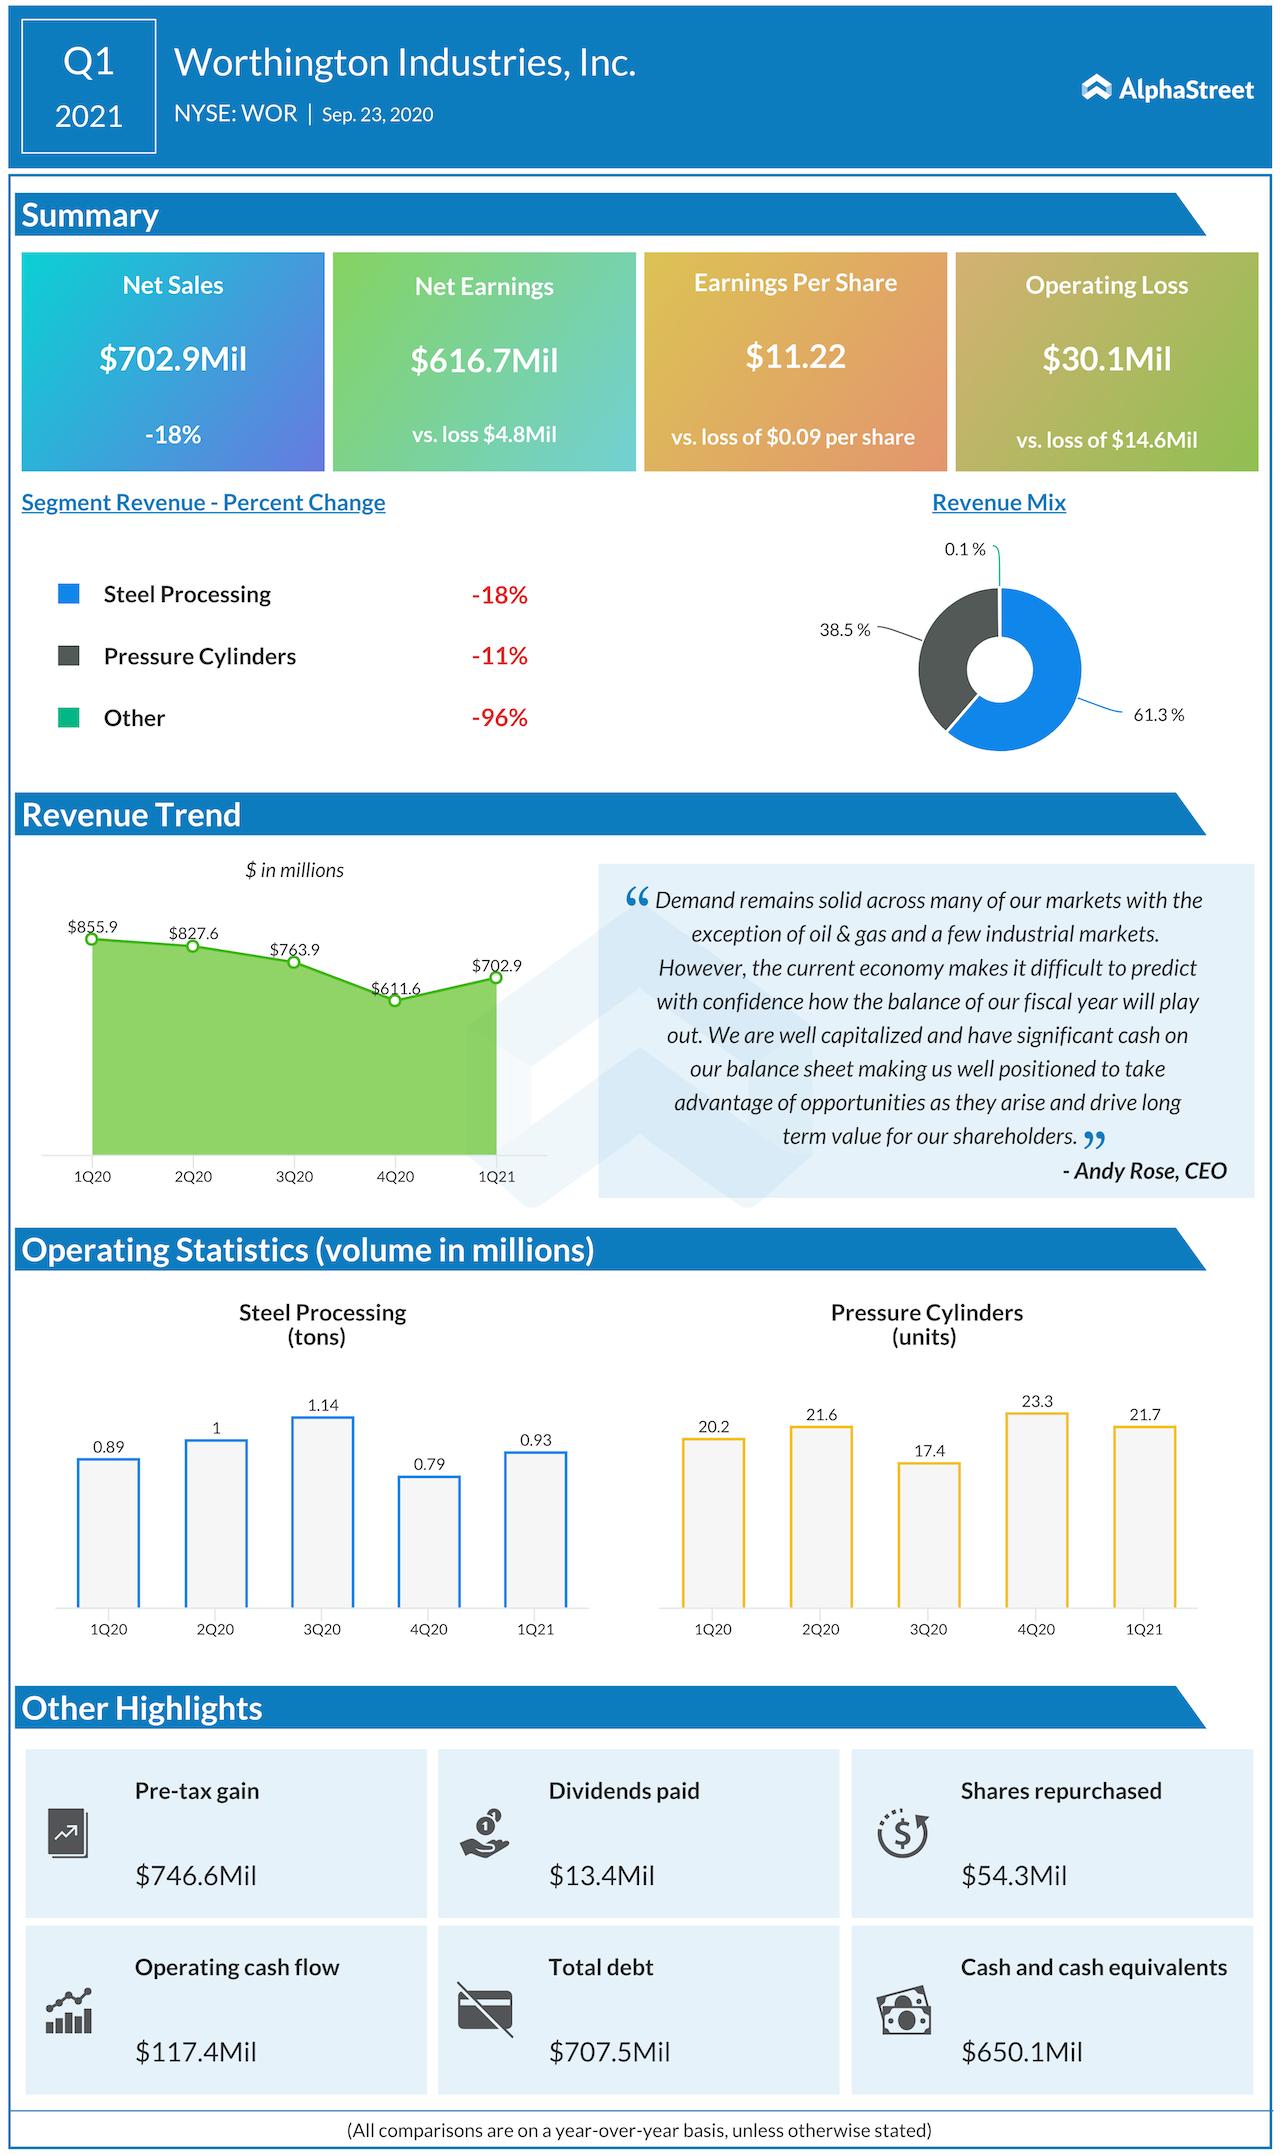 Worthington Industries Q1 2021 earnings